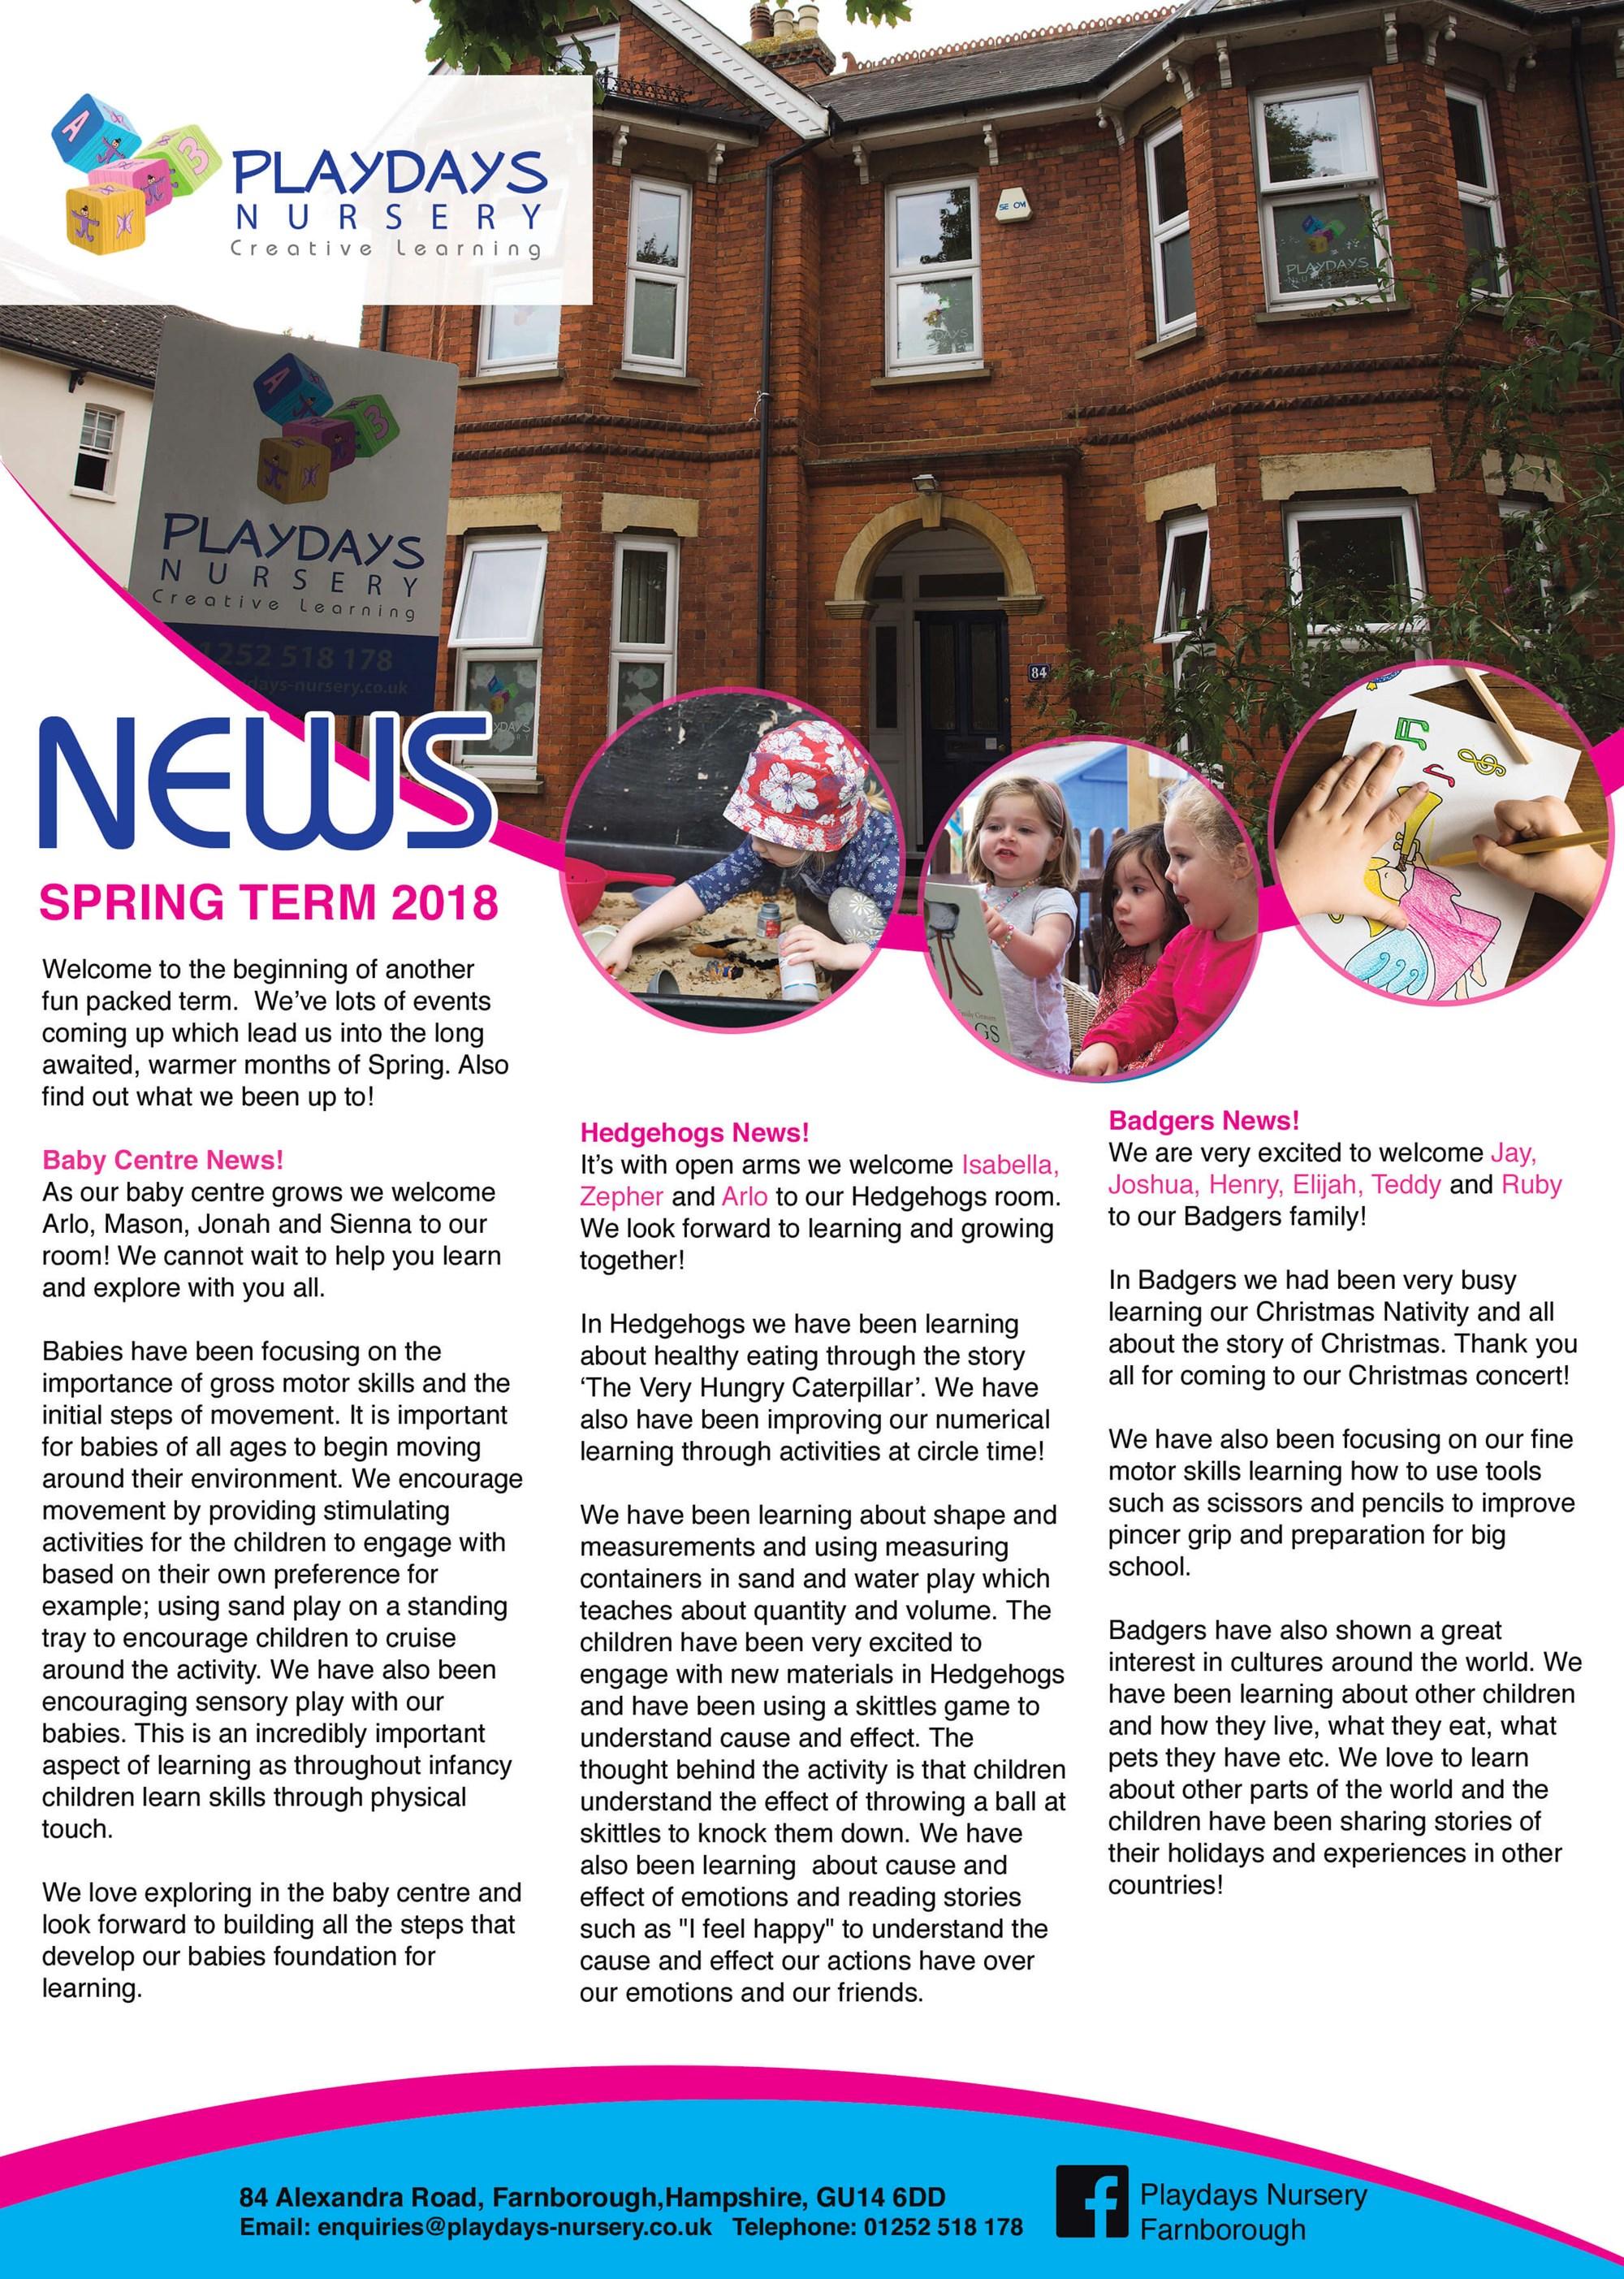 Baby centre news